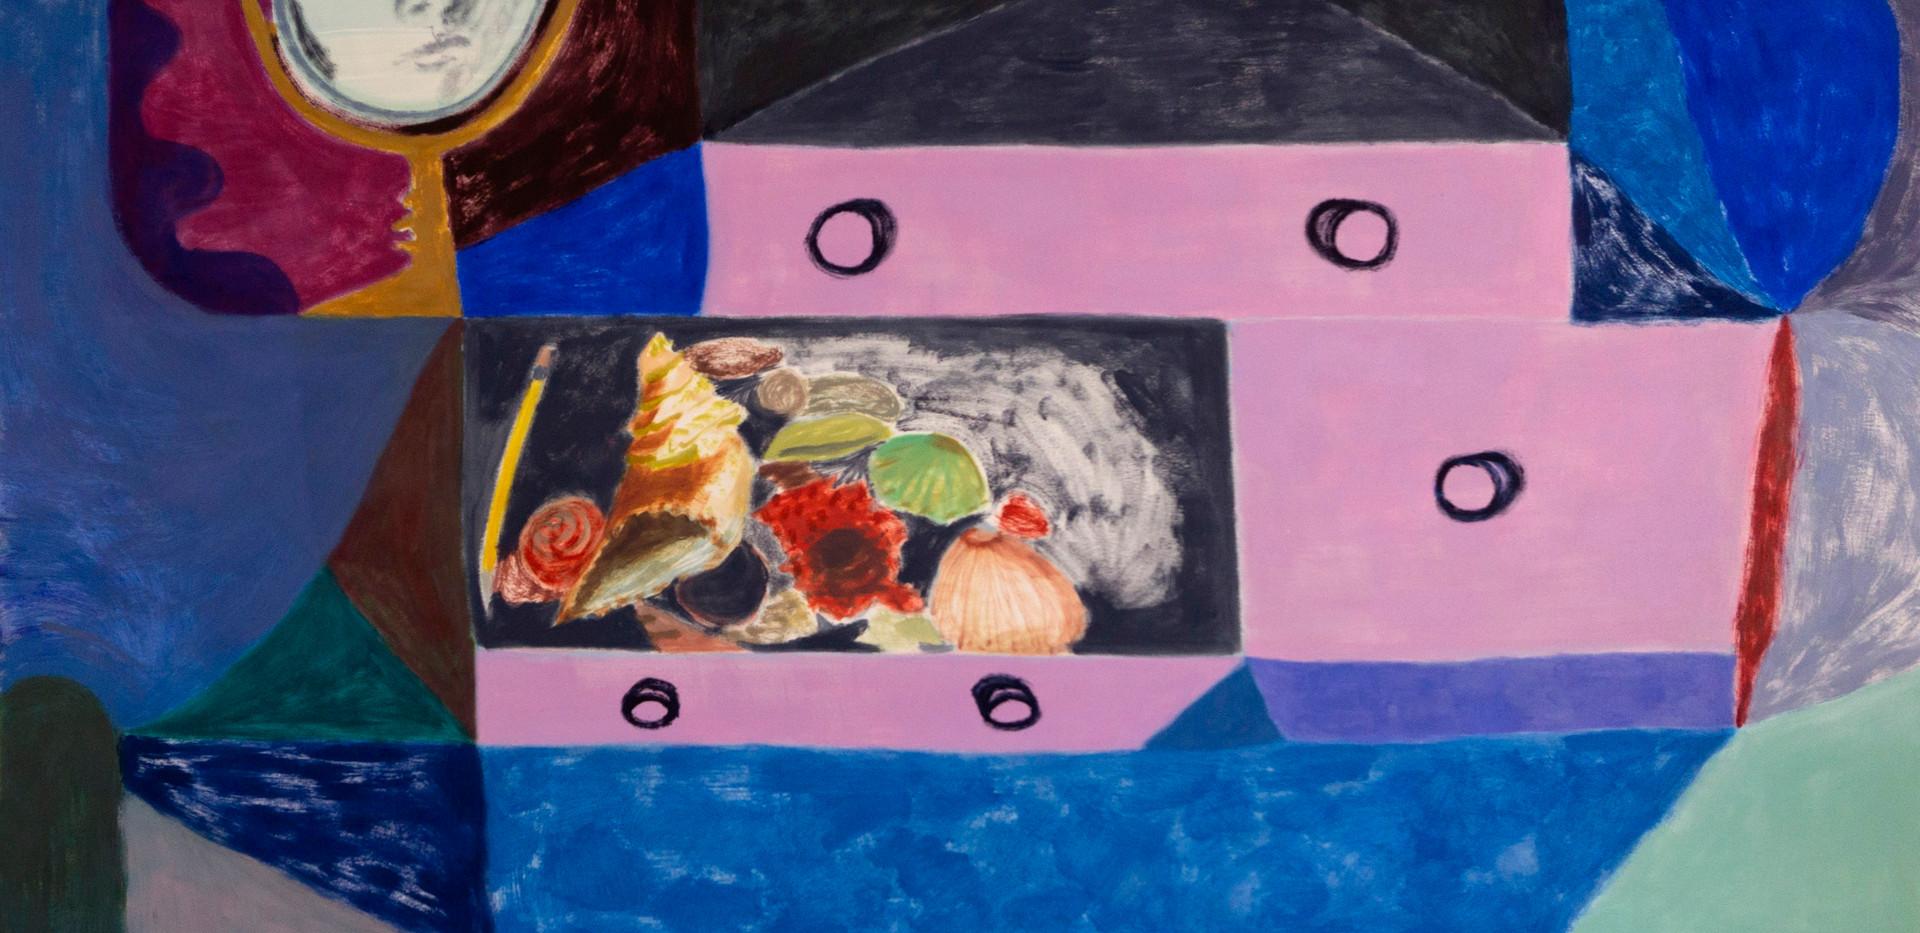 Courtney Mendenhall, Dresser, 2020, oil on paper, 22 x 30 in